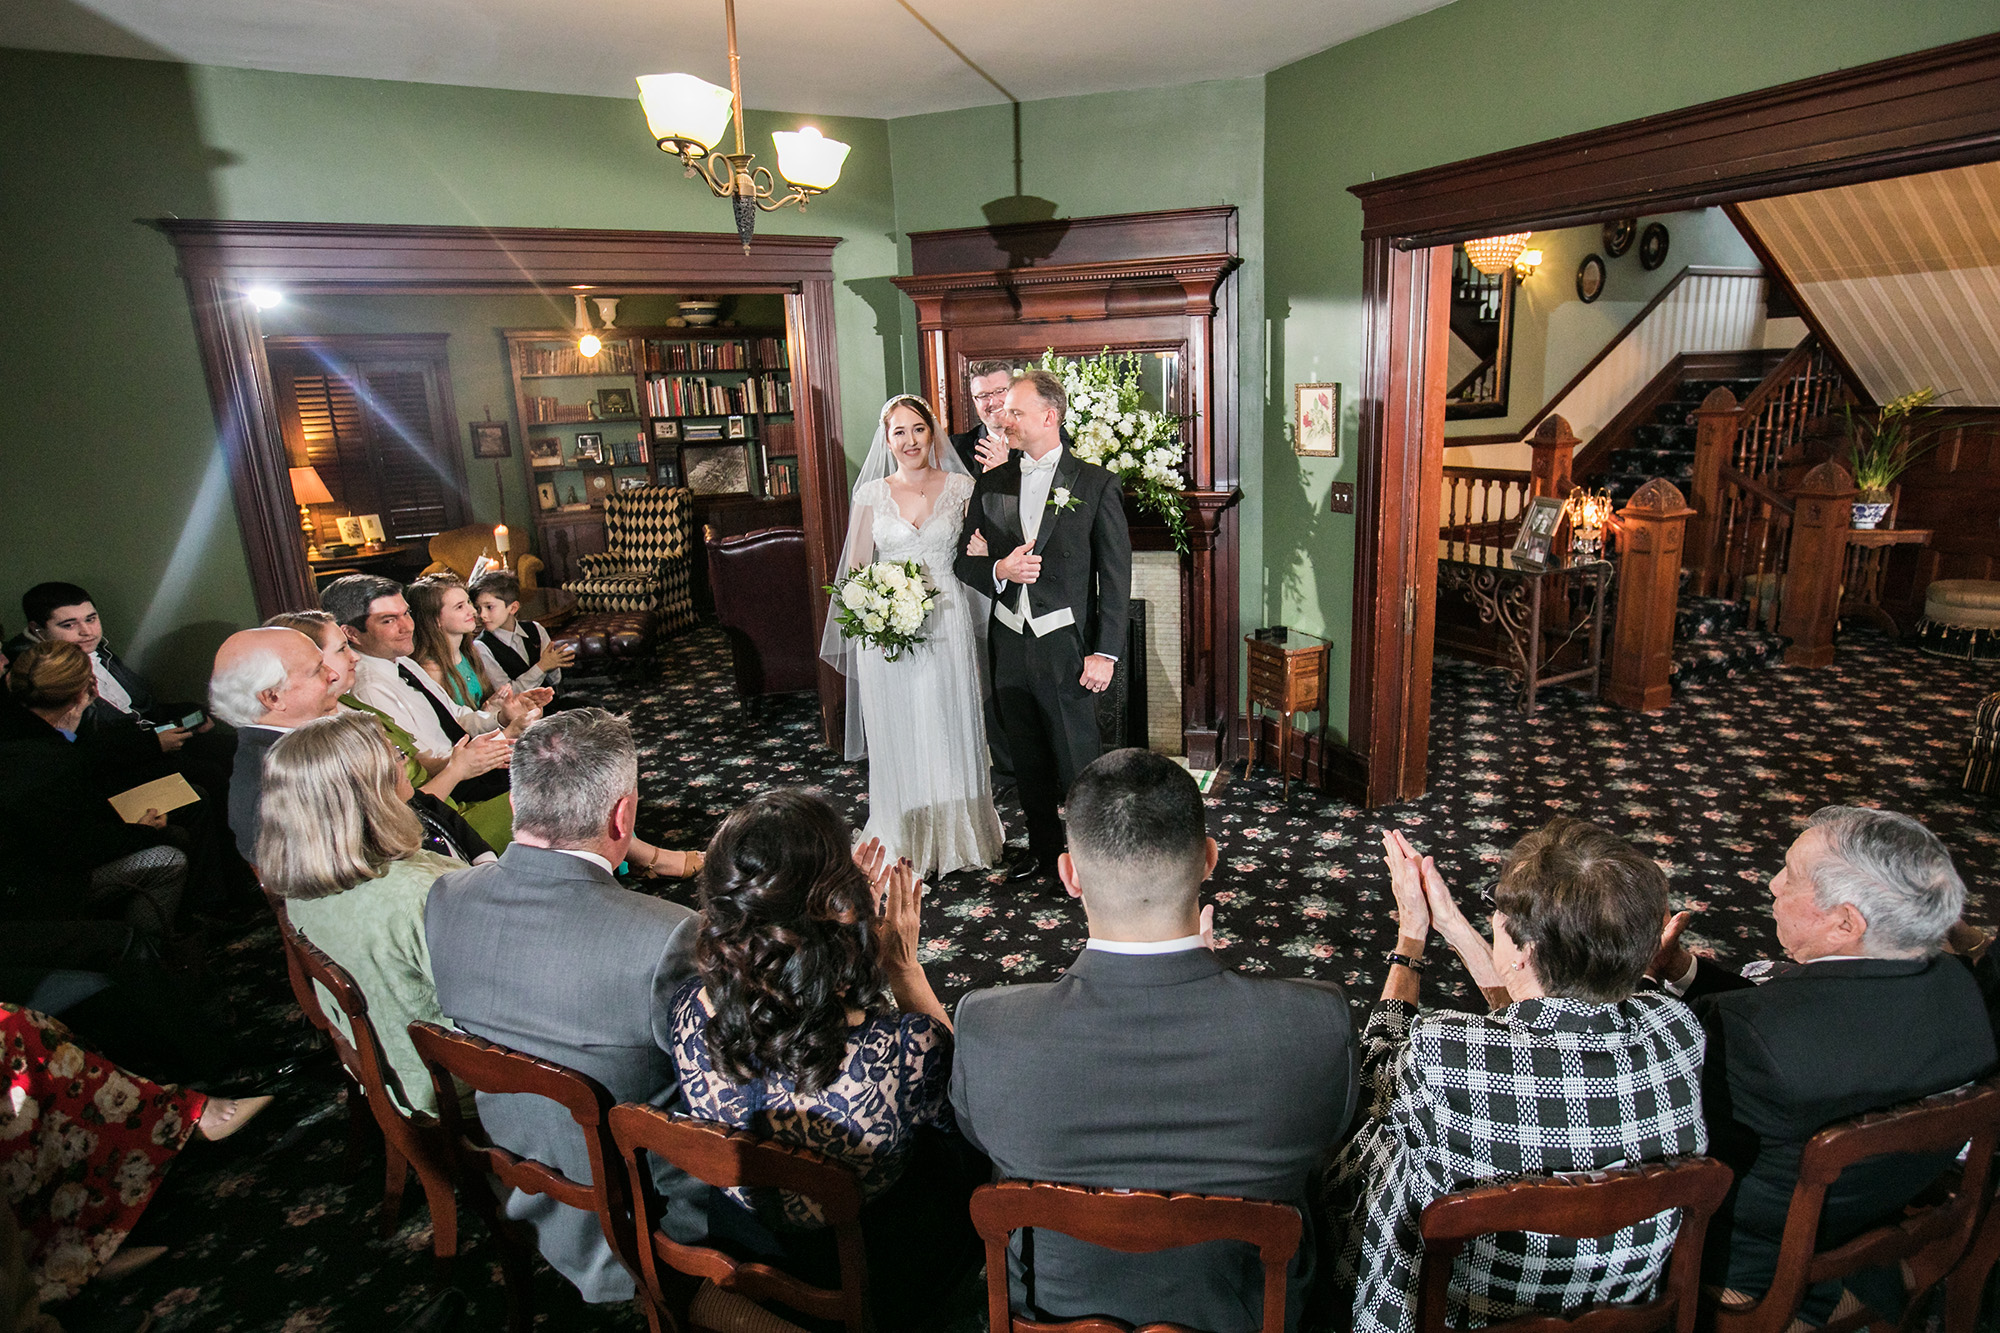 vintage-inspired-christmas-house-wedding-carrie-vines-051.jpg